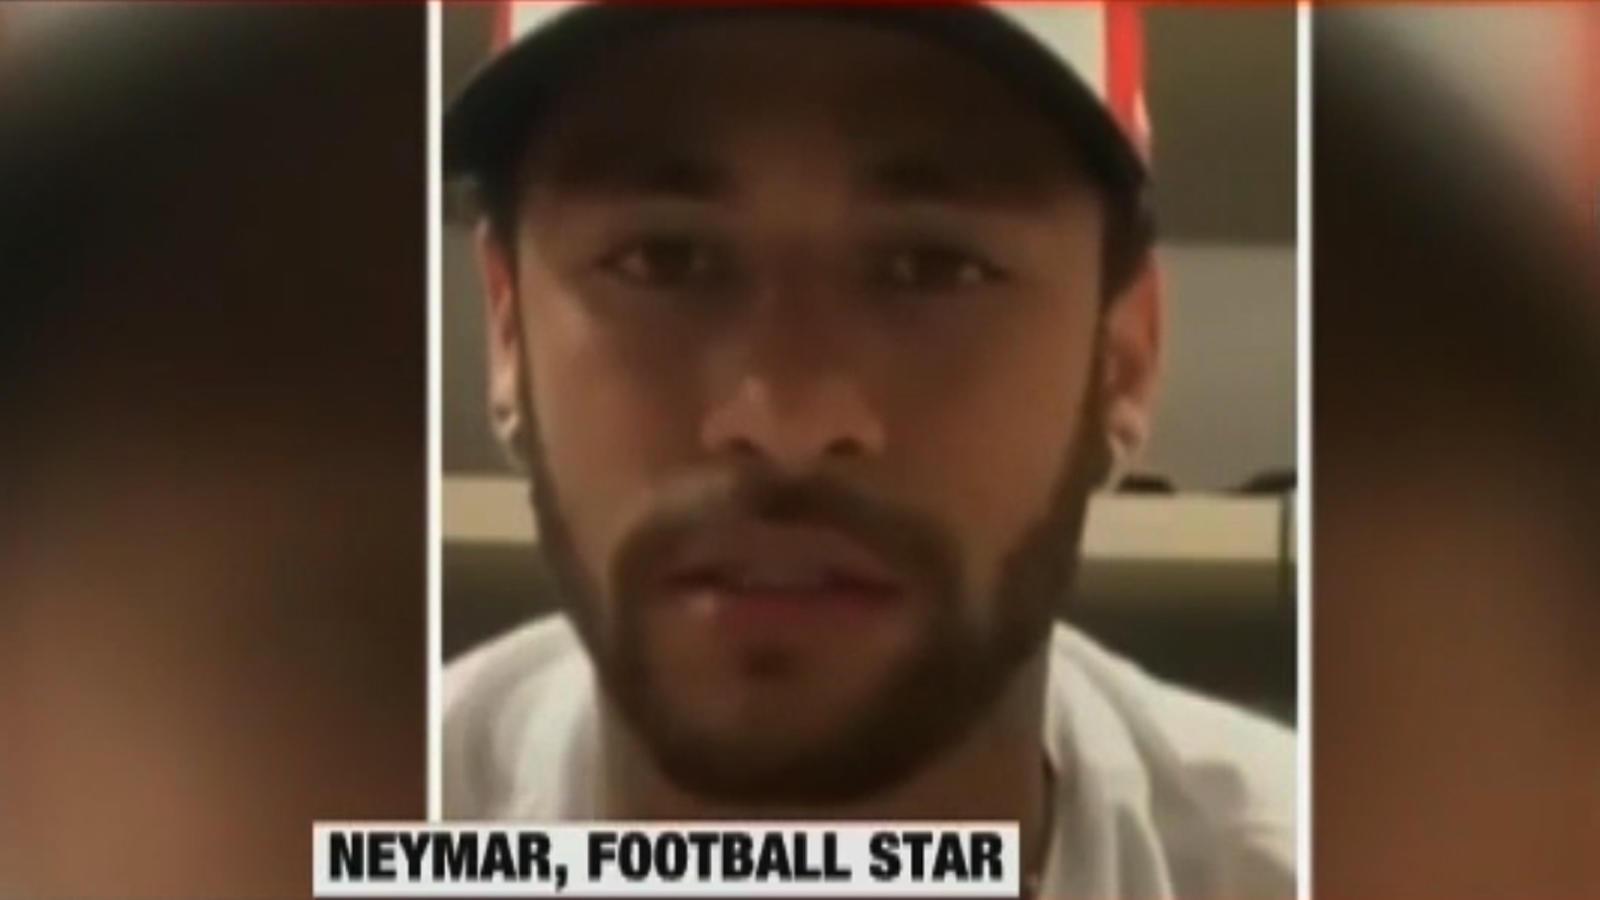 brazil-football-star-neymar-denies-rape-allegations